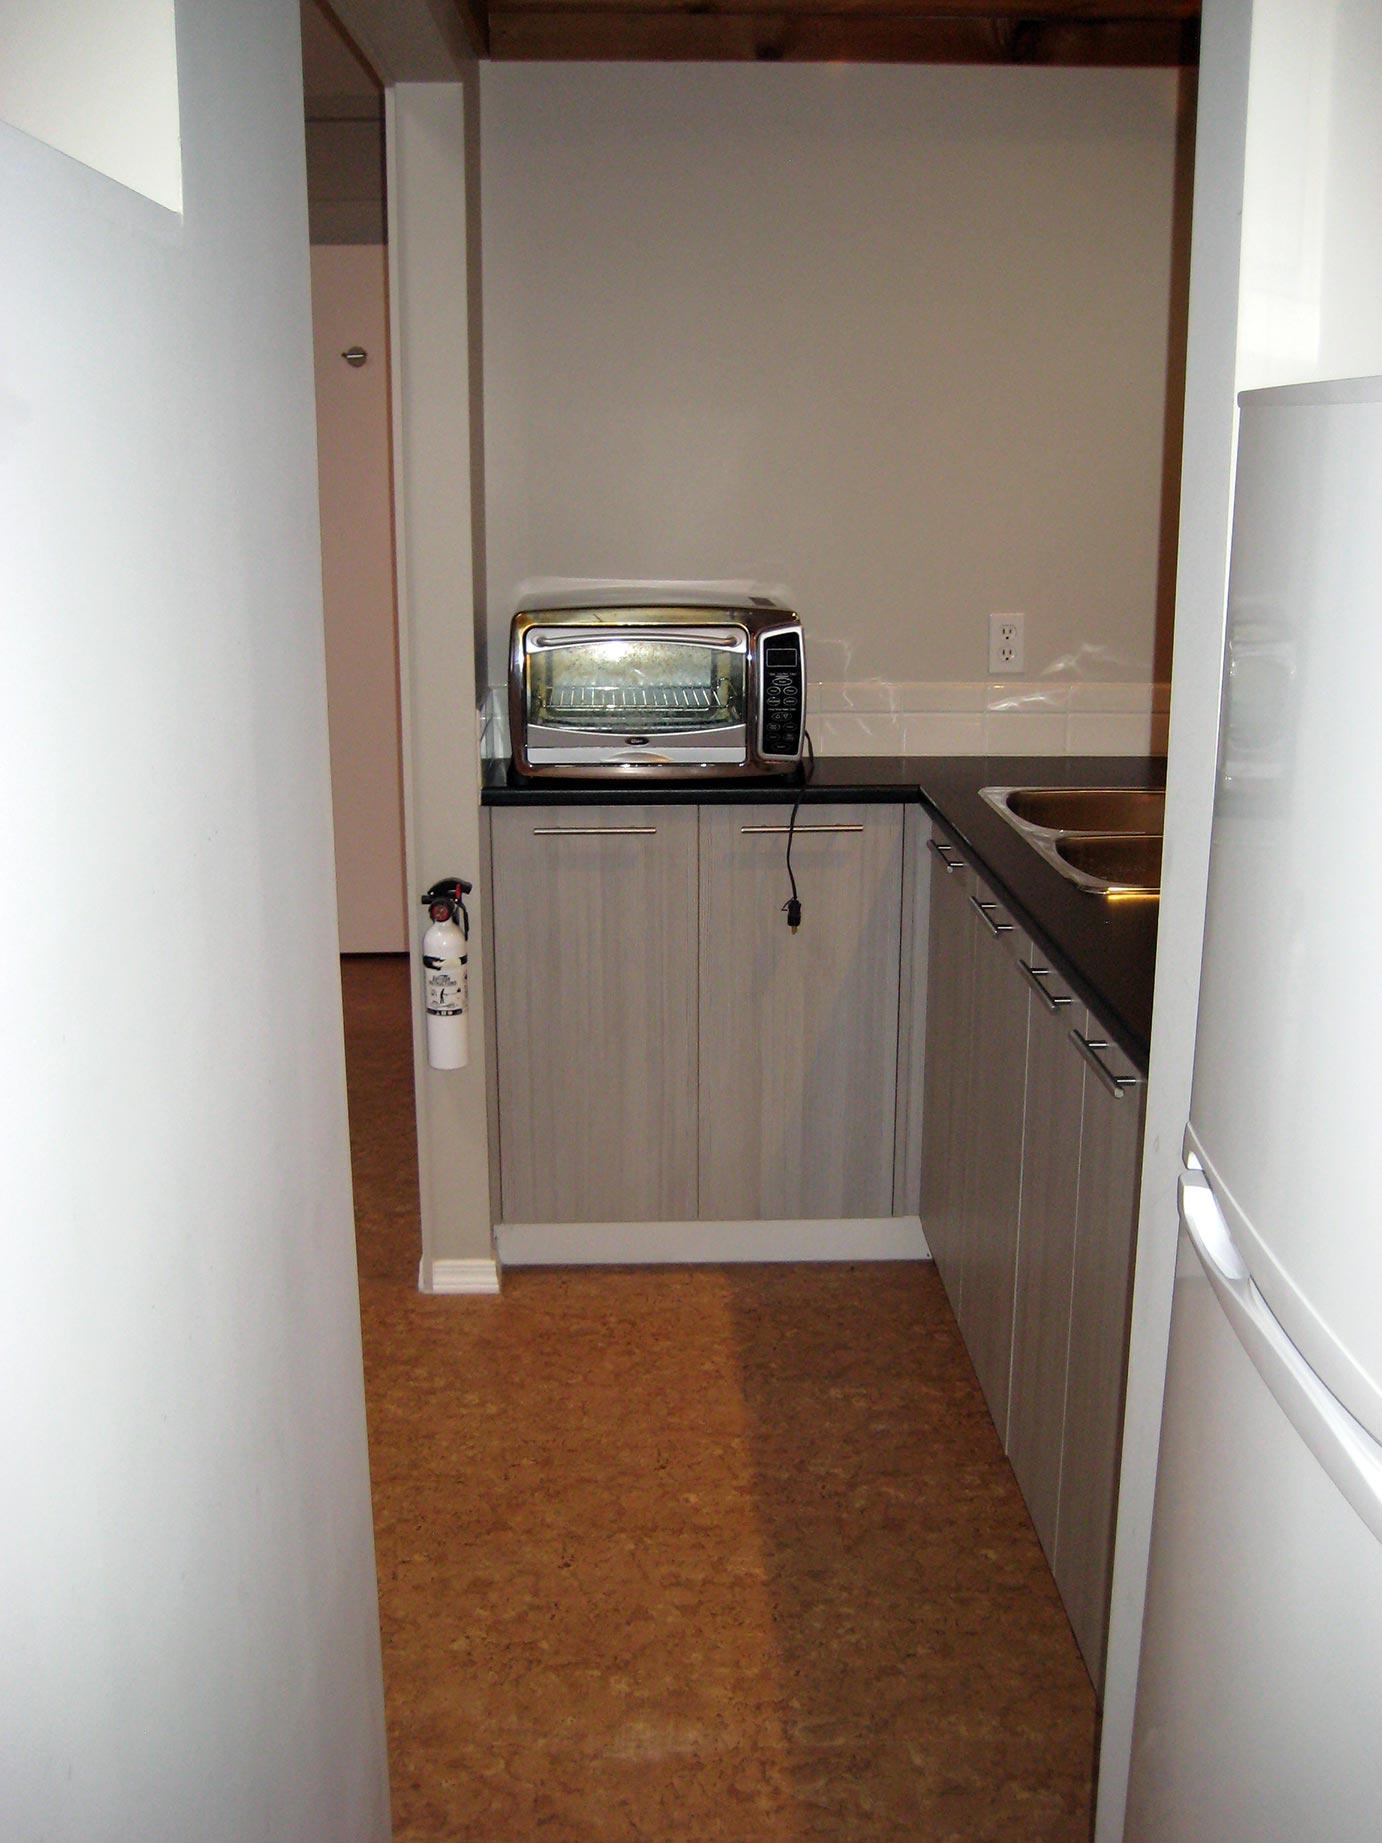 Kitchen View & Countertop Stove